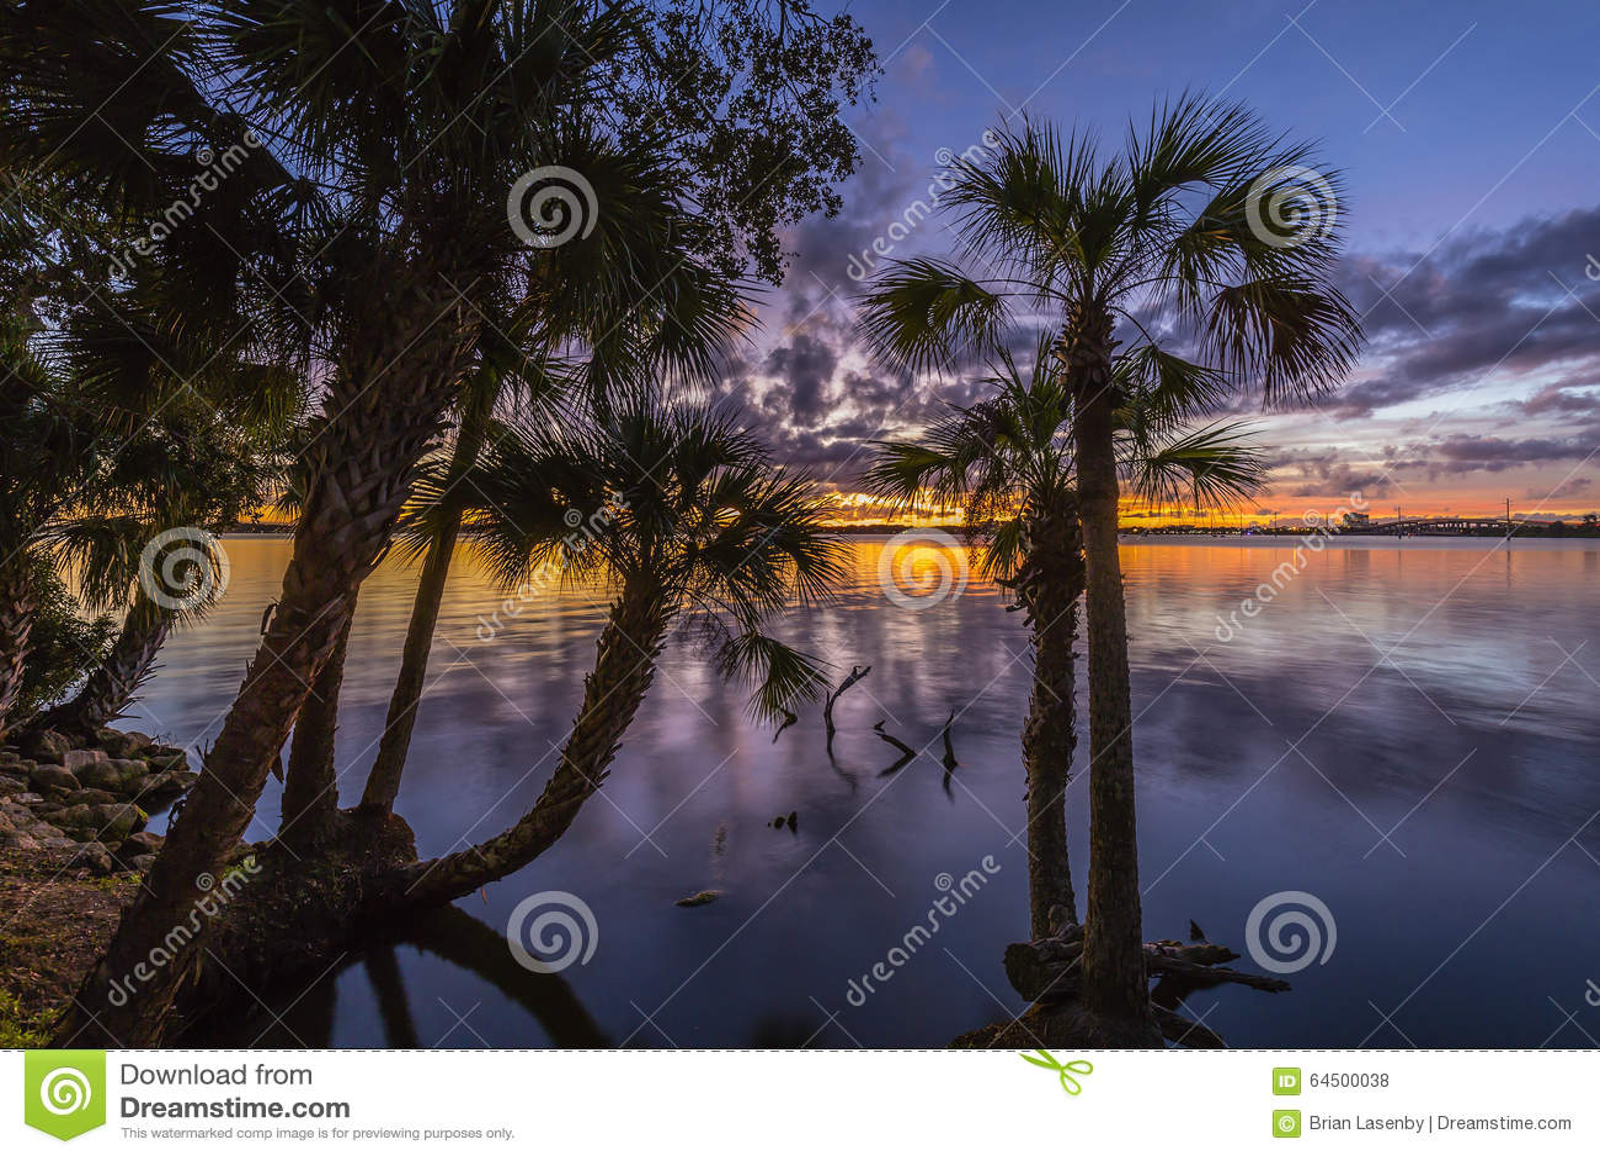 Sunset Over the Indian River - Merritt Island, Florida